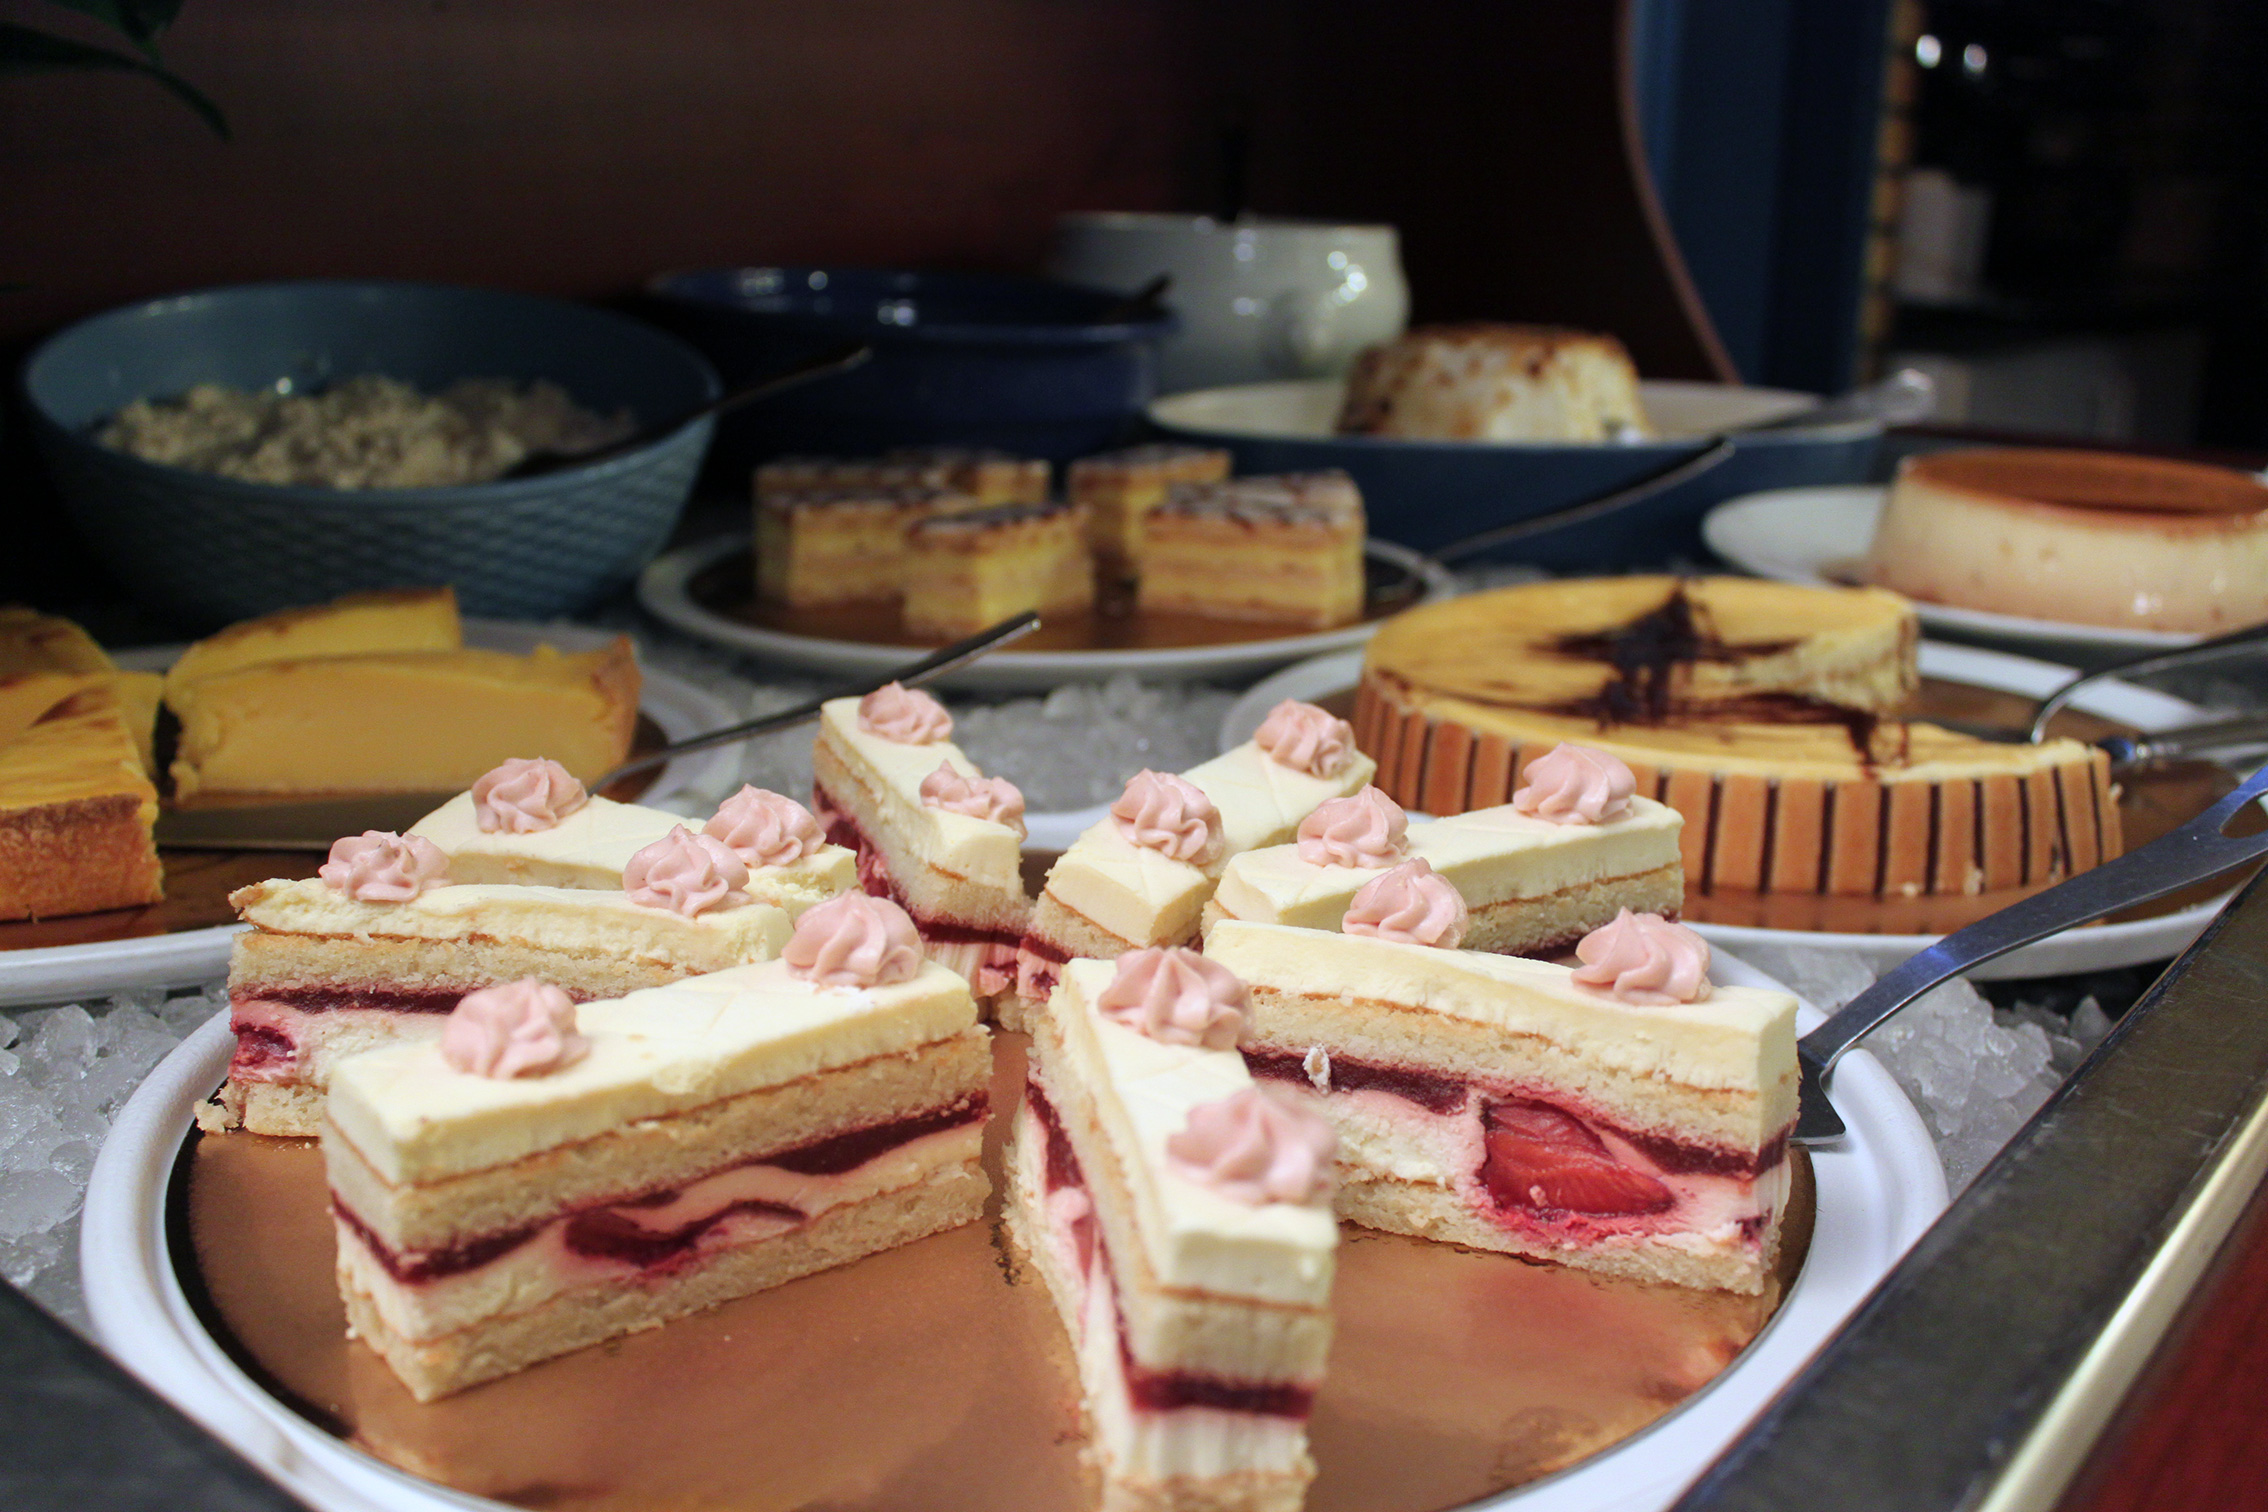 Buffet desserts à volonte hotel bleu france cergy pontoise eragny